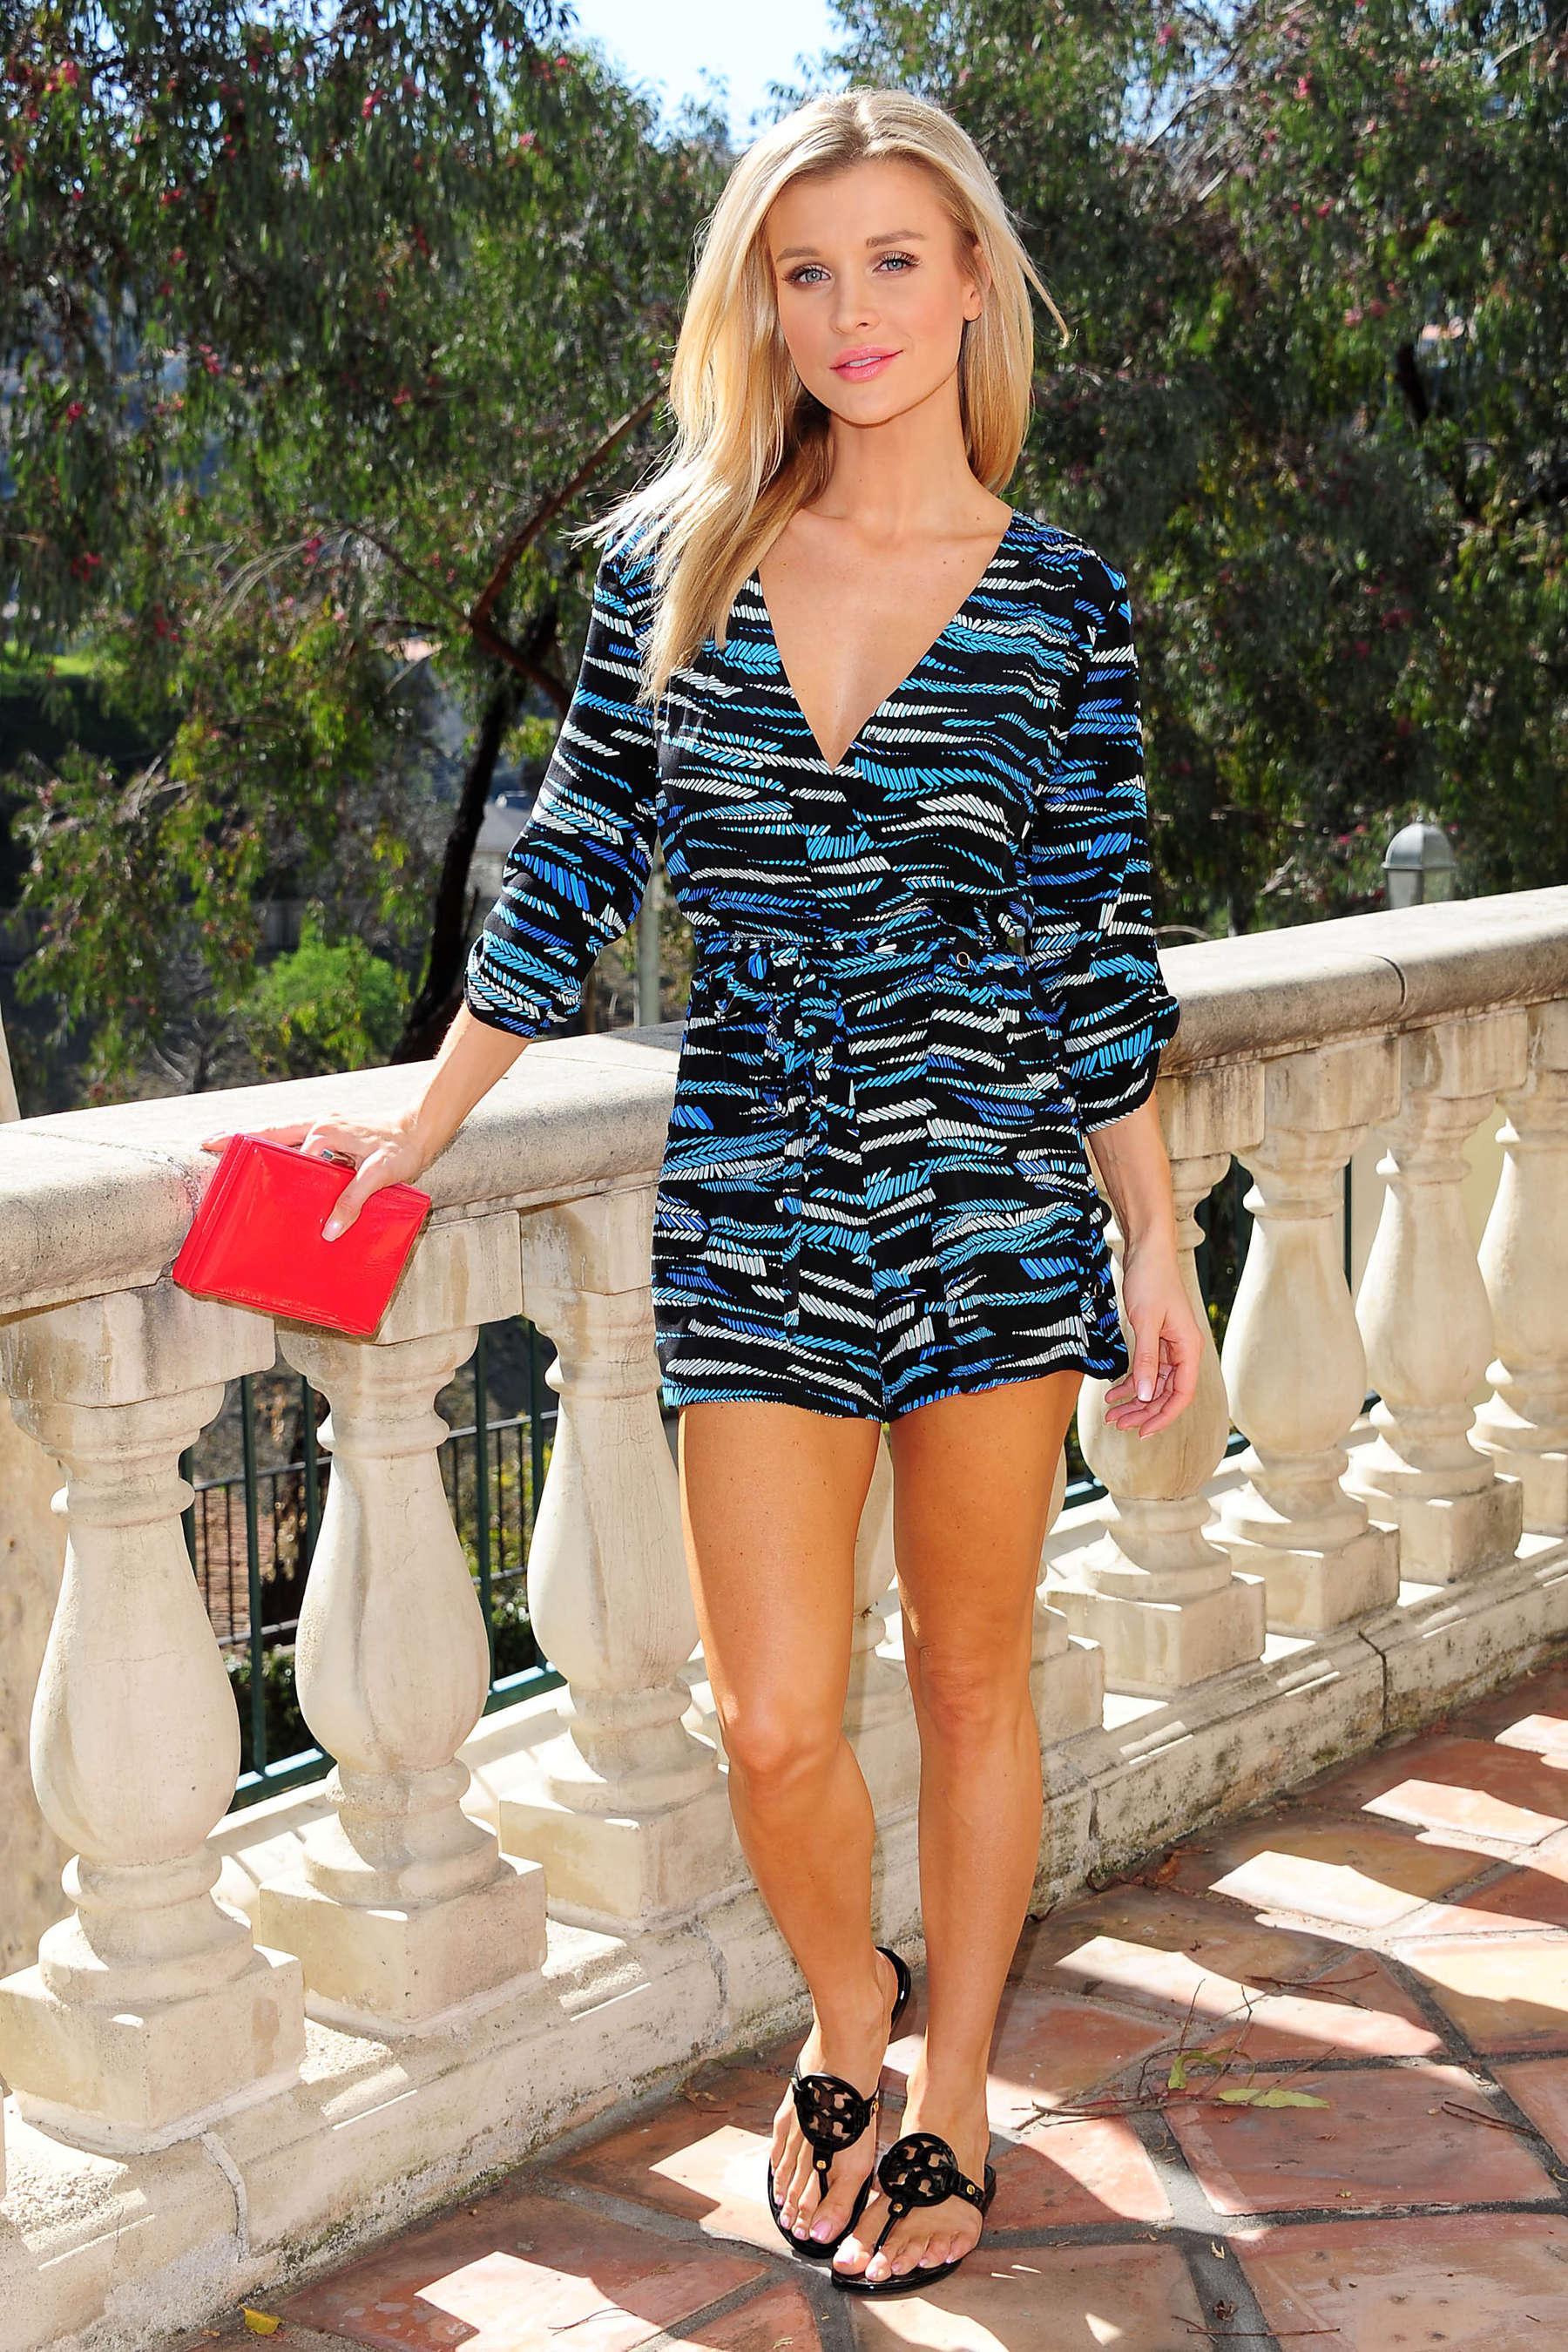 Joanna Krupa Photoshoot In Miami 05 Gotceleb